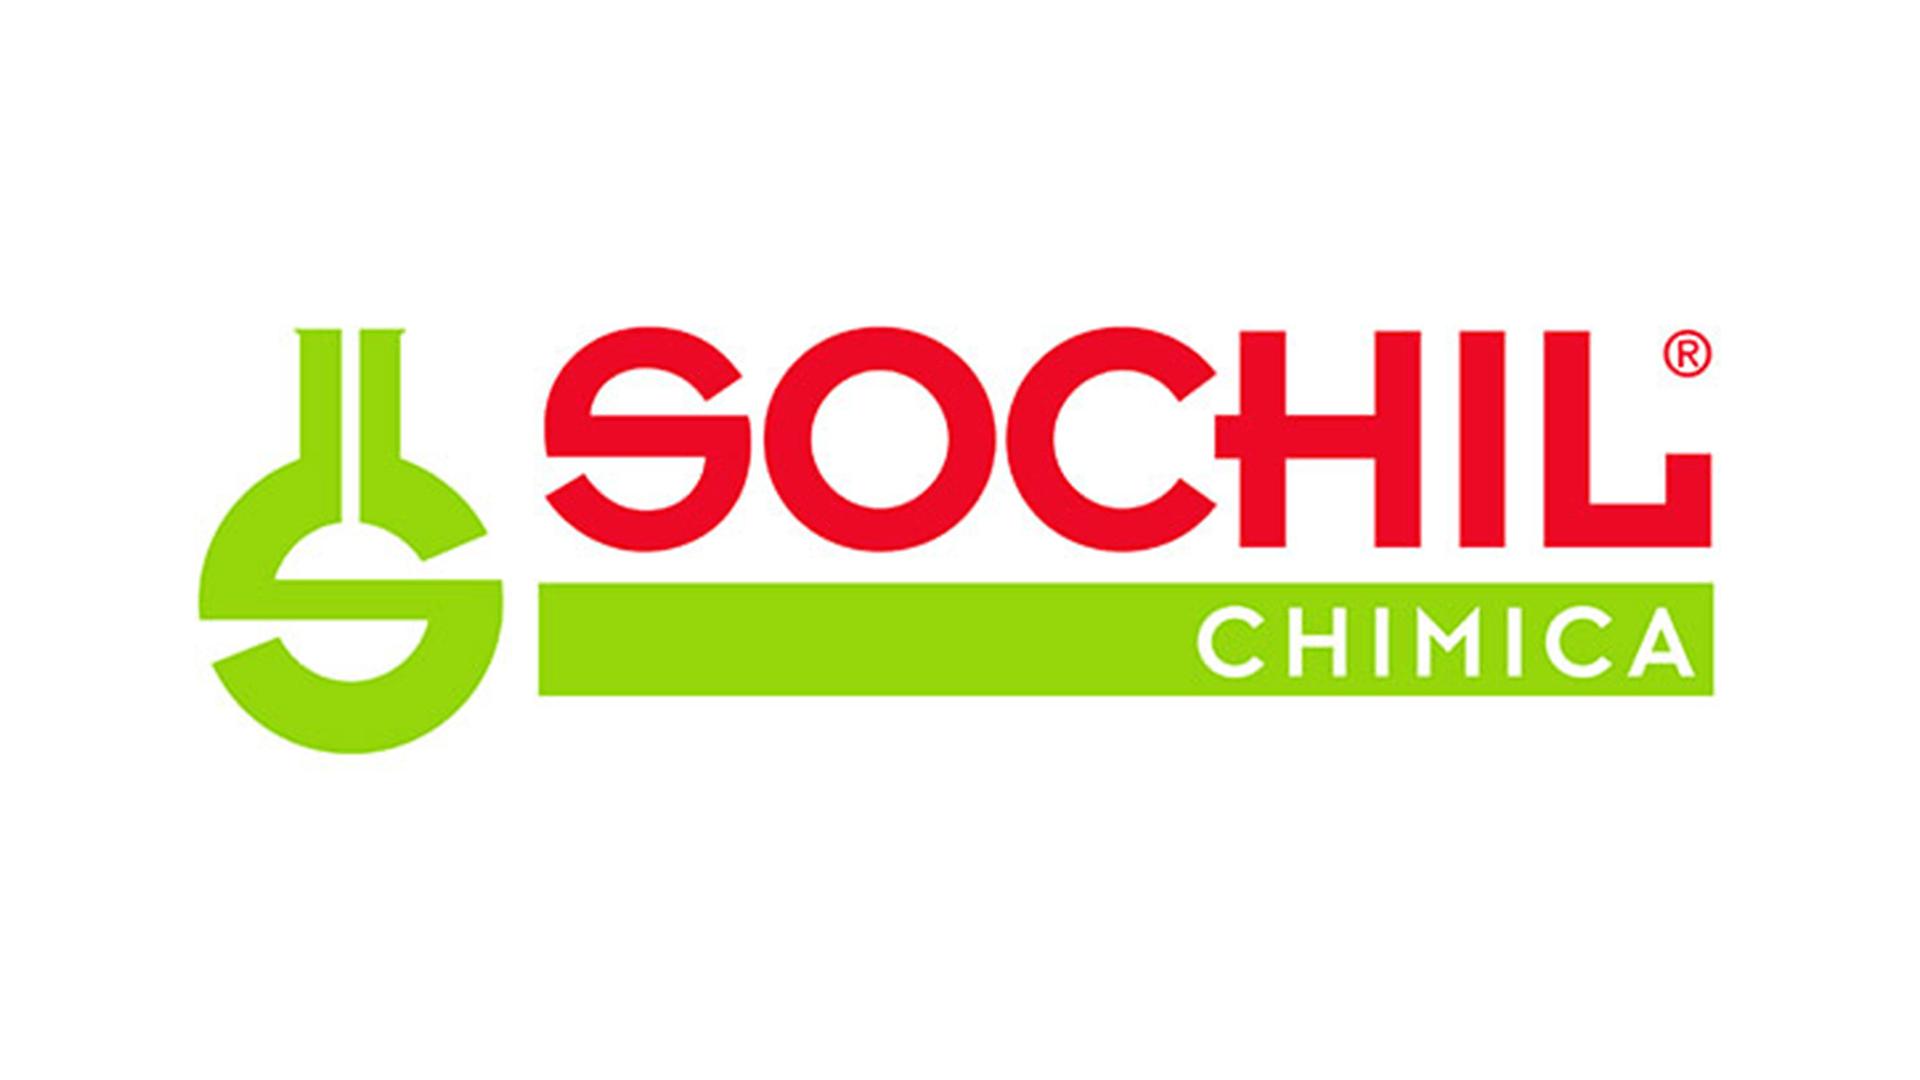 Sochil chimica